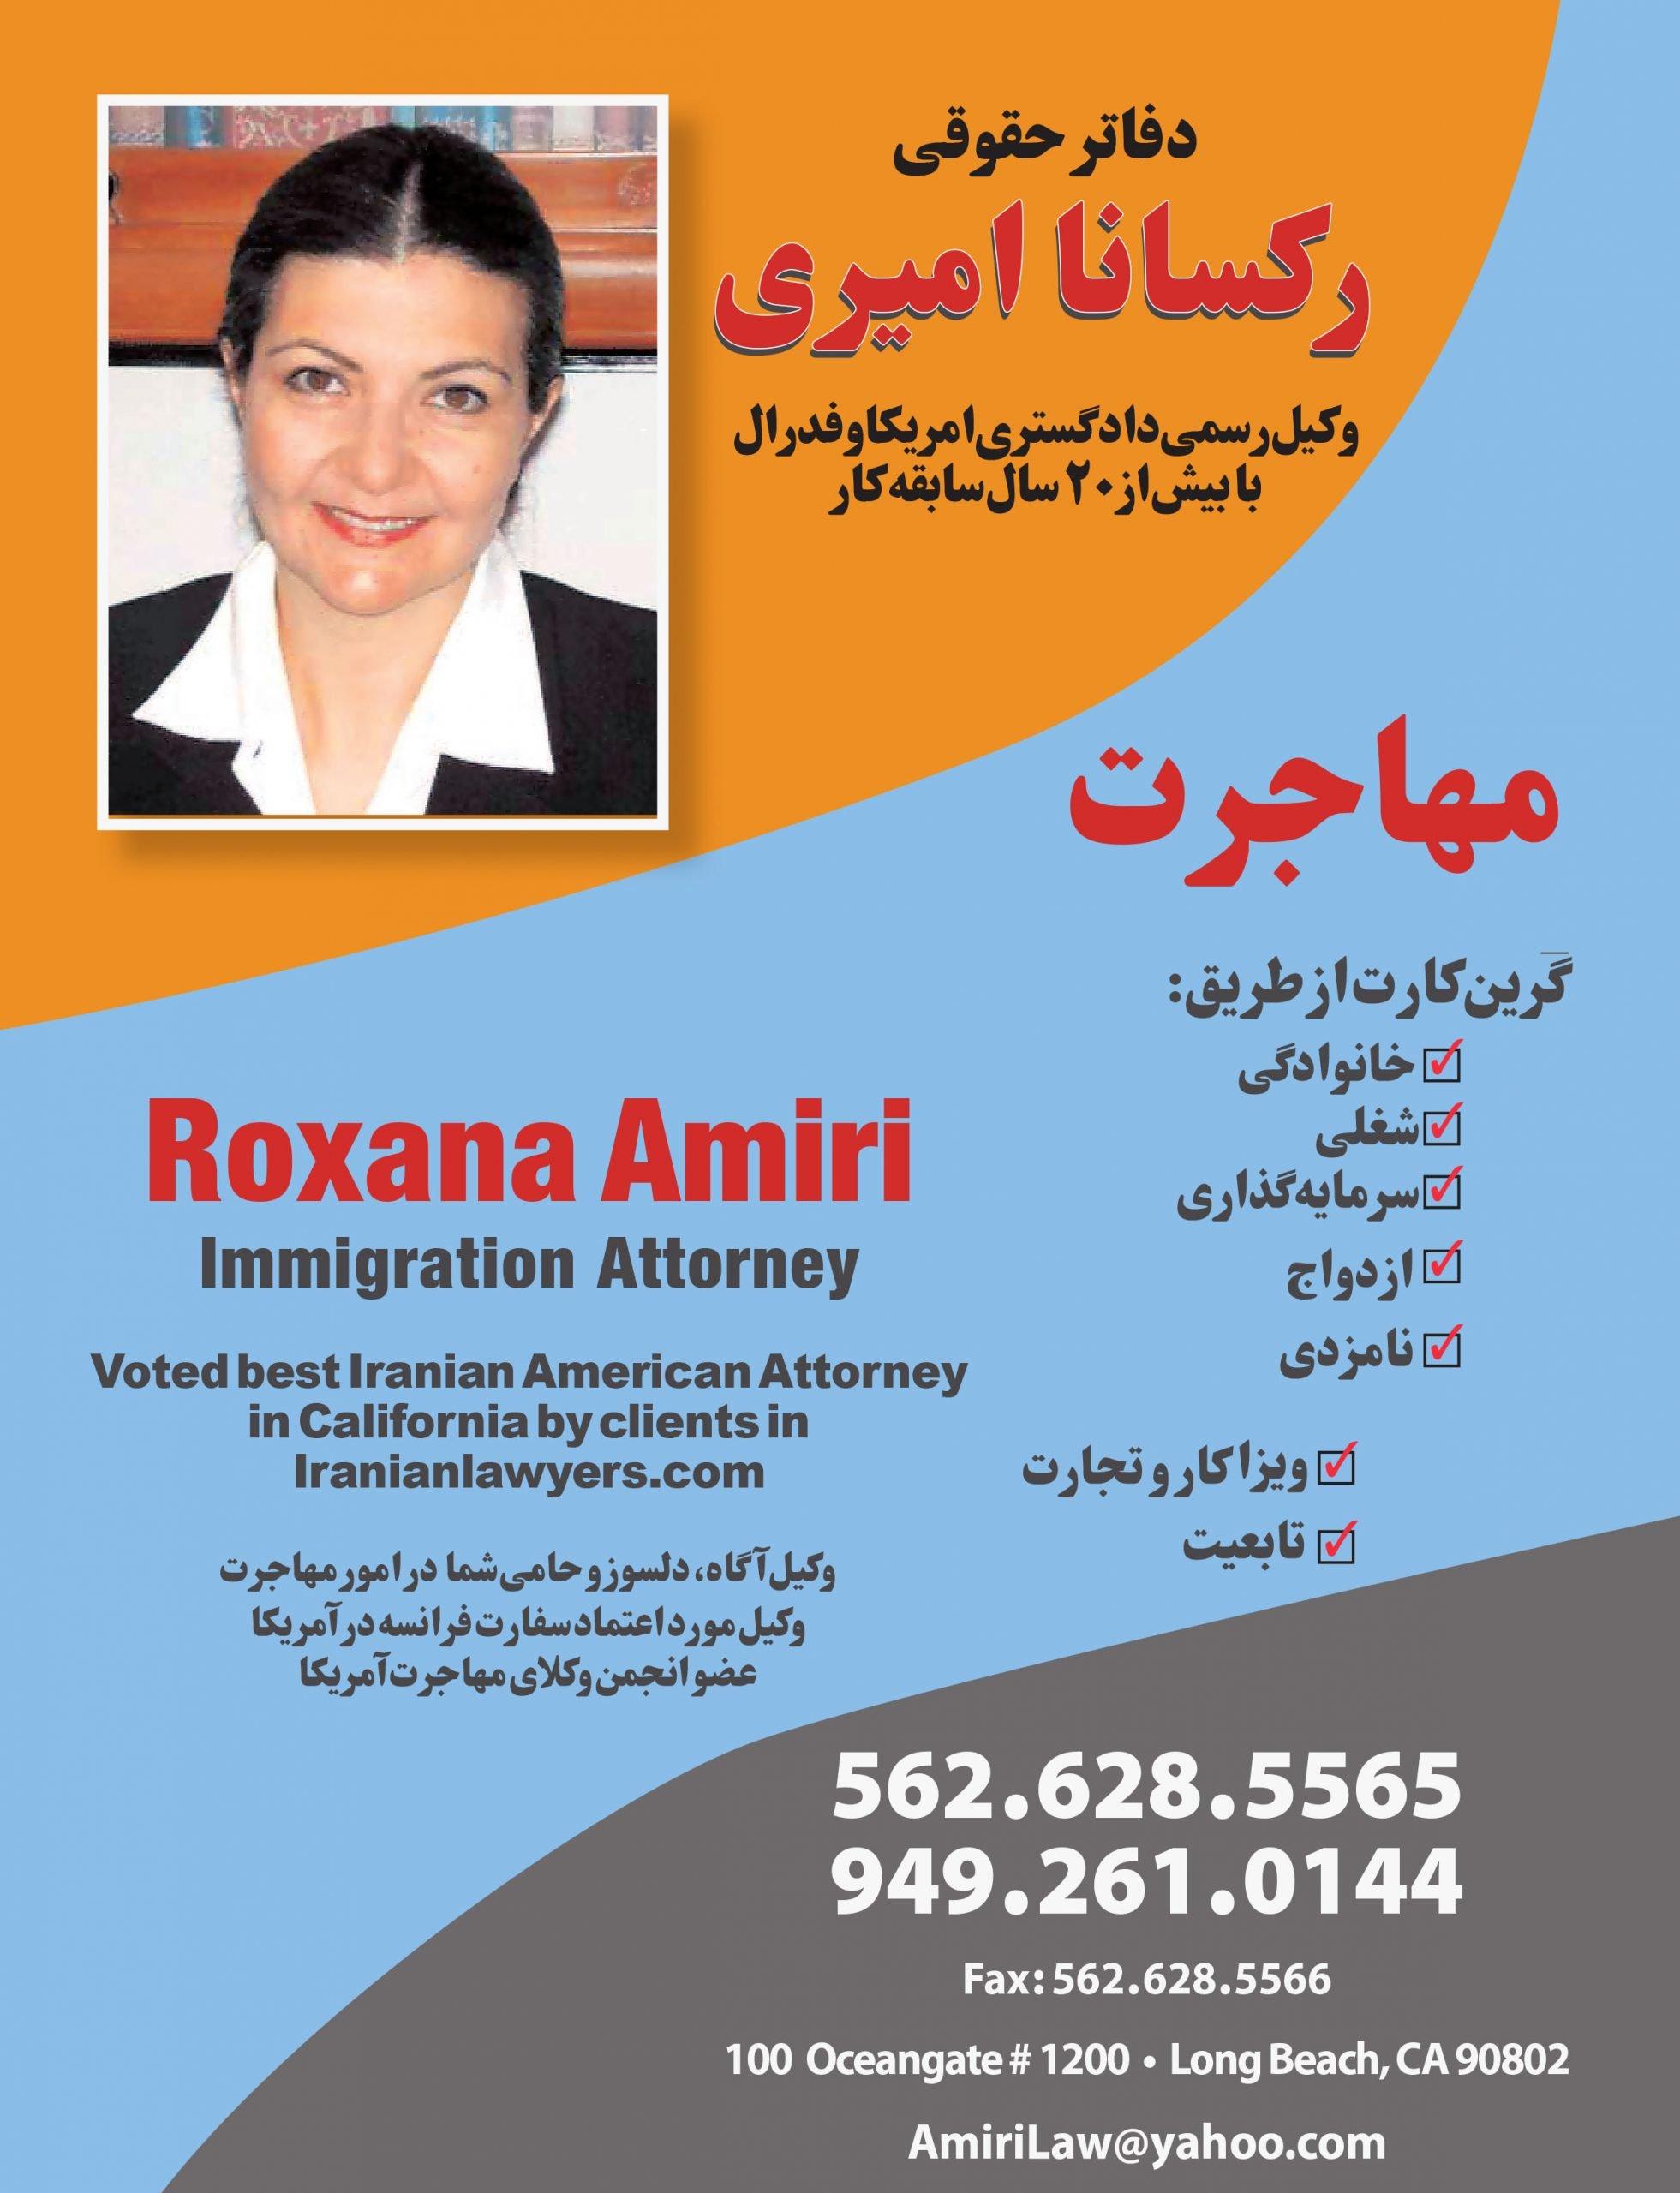 Roxana Amiri